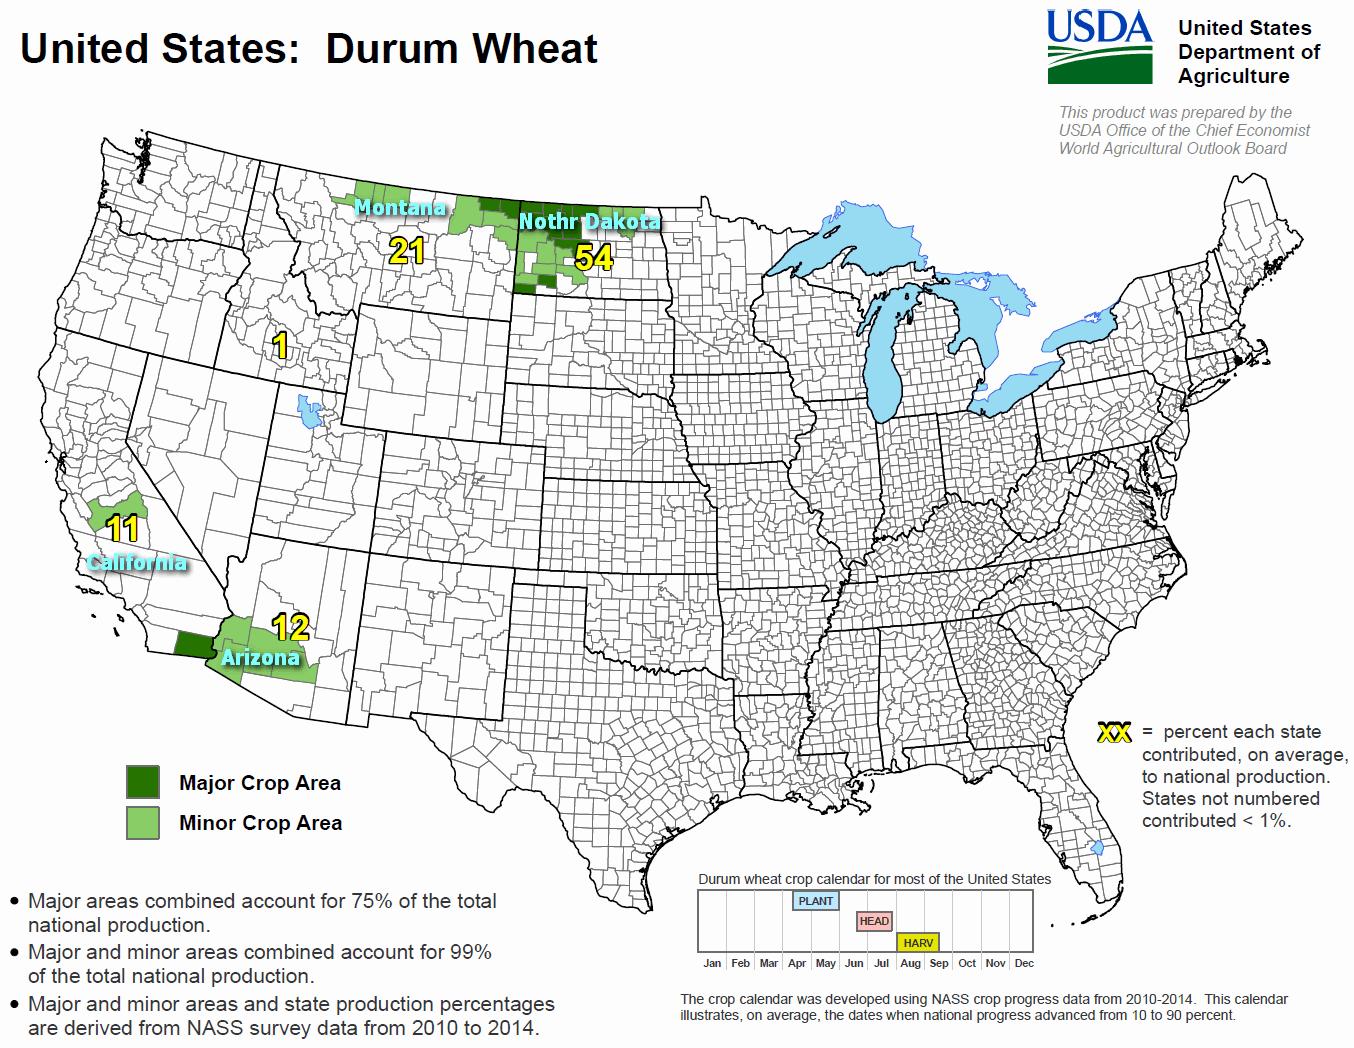 U.S. Durum Wheat Crop Map.png